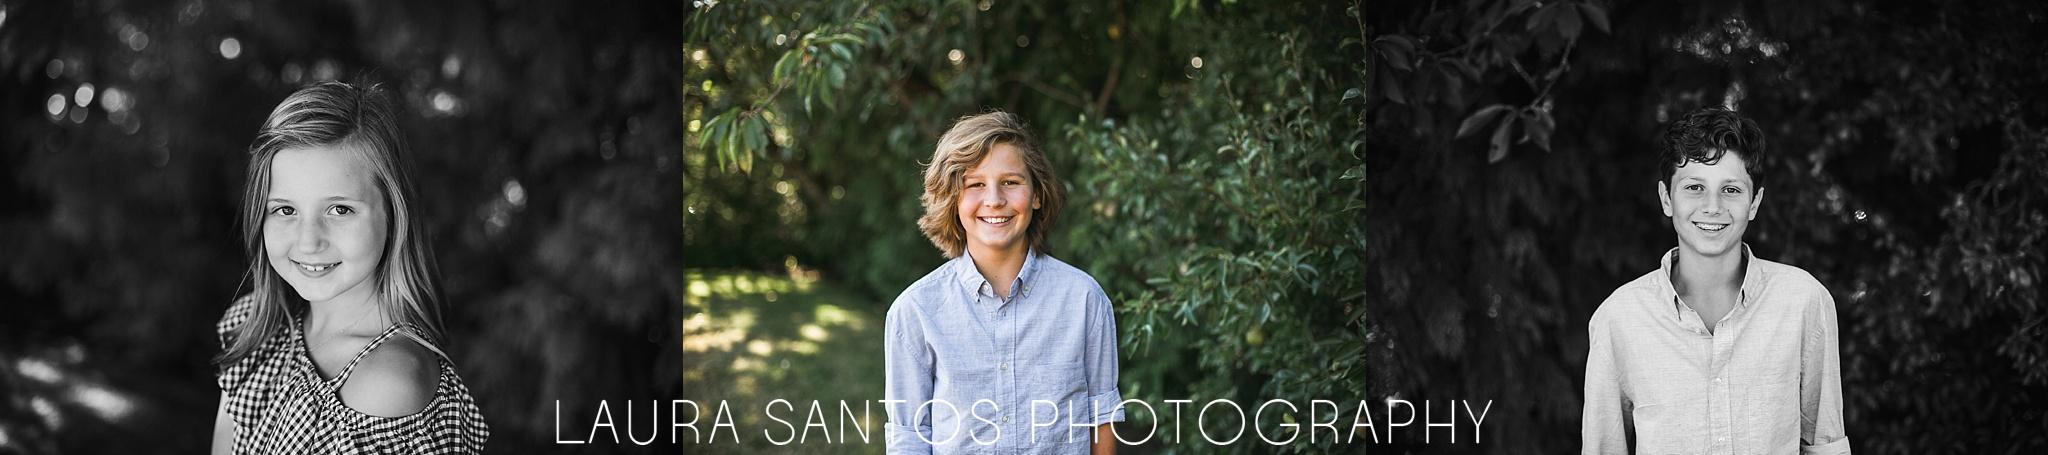 Laura Santos Photography Portland Oregon Family Photographer_0238.jpg